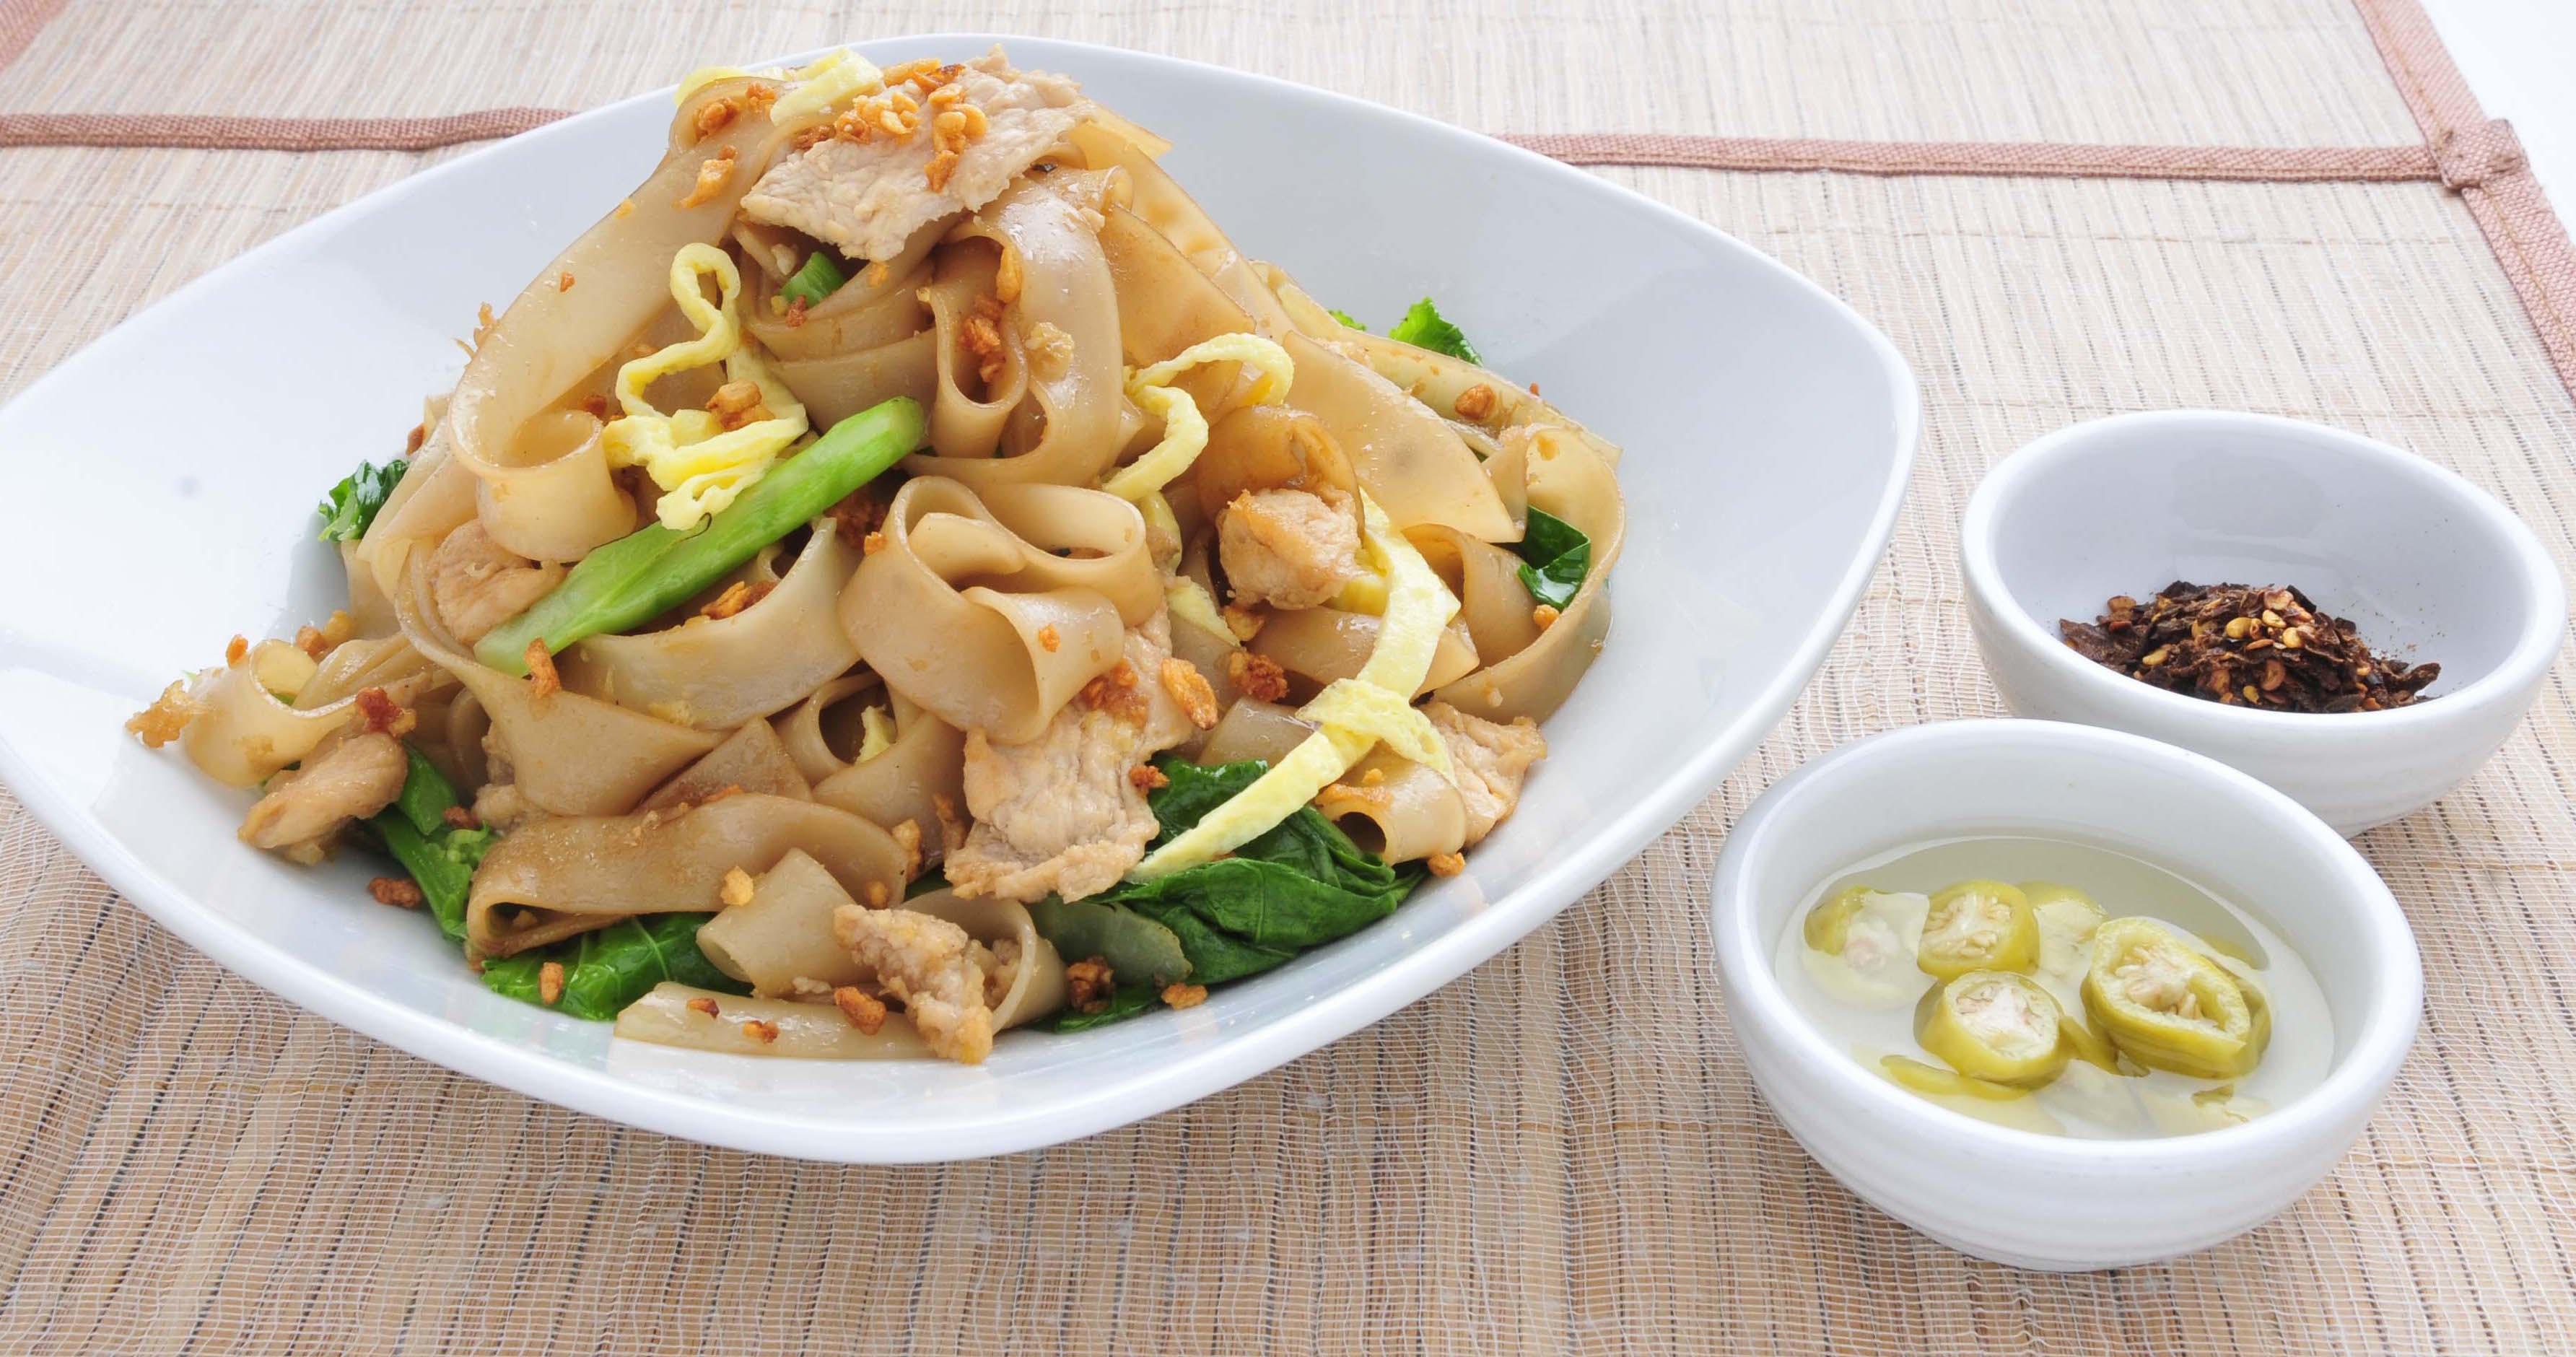 Stir Fried Flat Noodles w/ Chicken